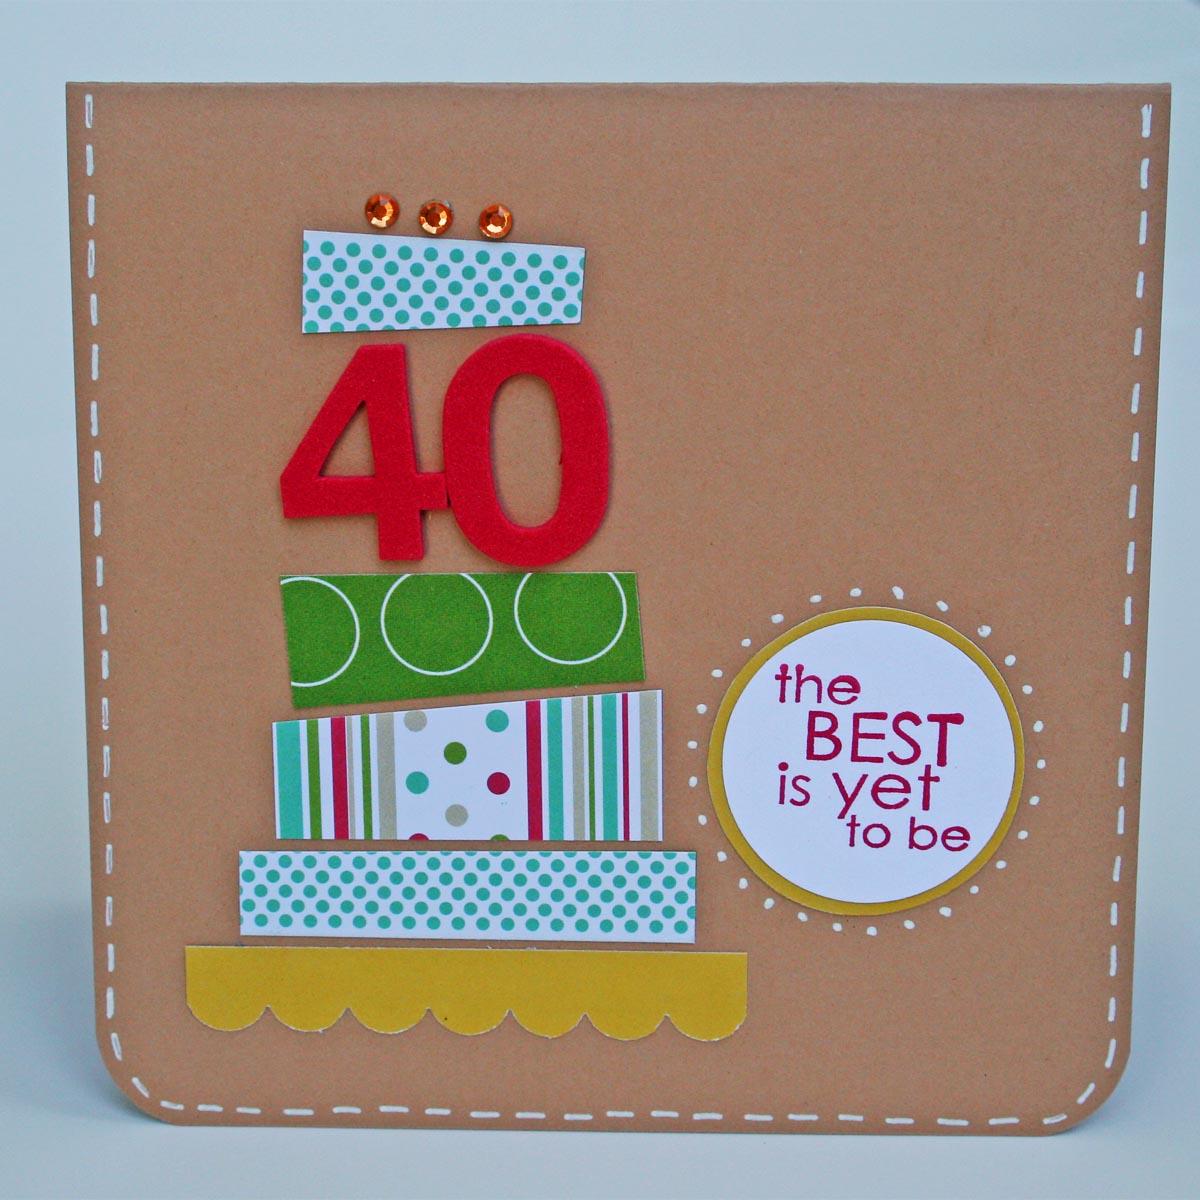 Carrot Top X 3: 40th Birthday Card